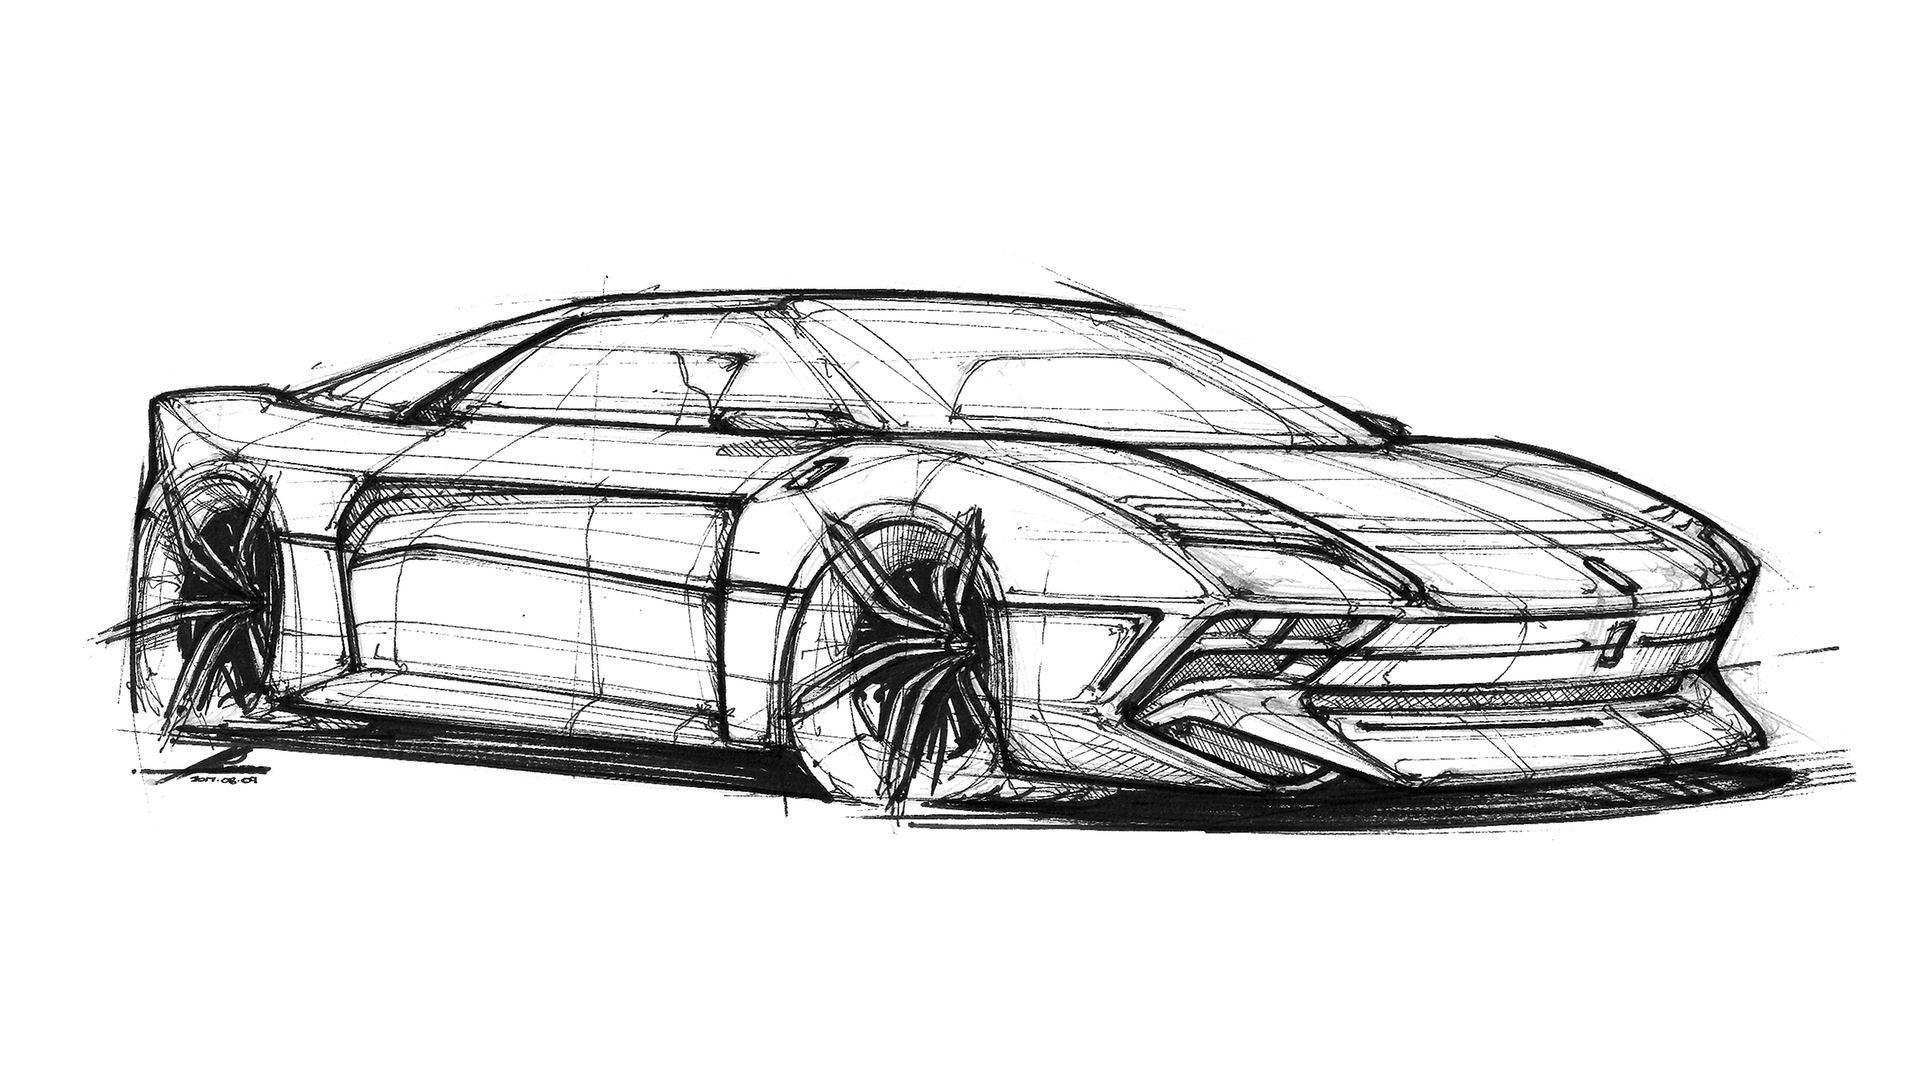 64 Best Review Ferrari 2020 Gto First Drive for Ferrari 2020 Gto